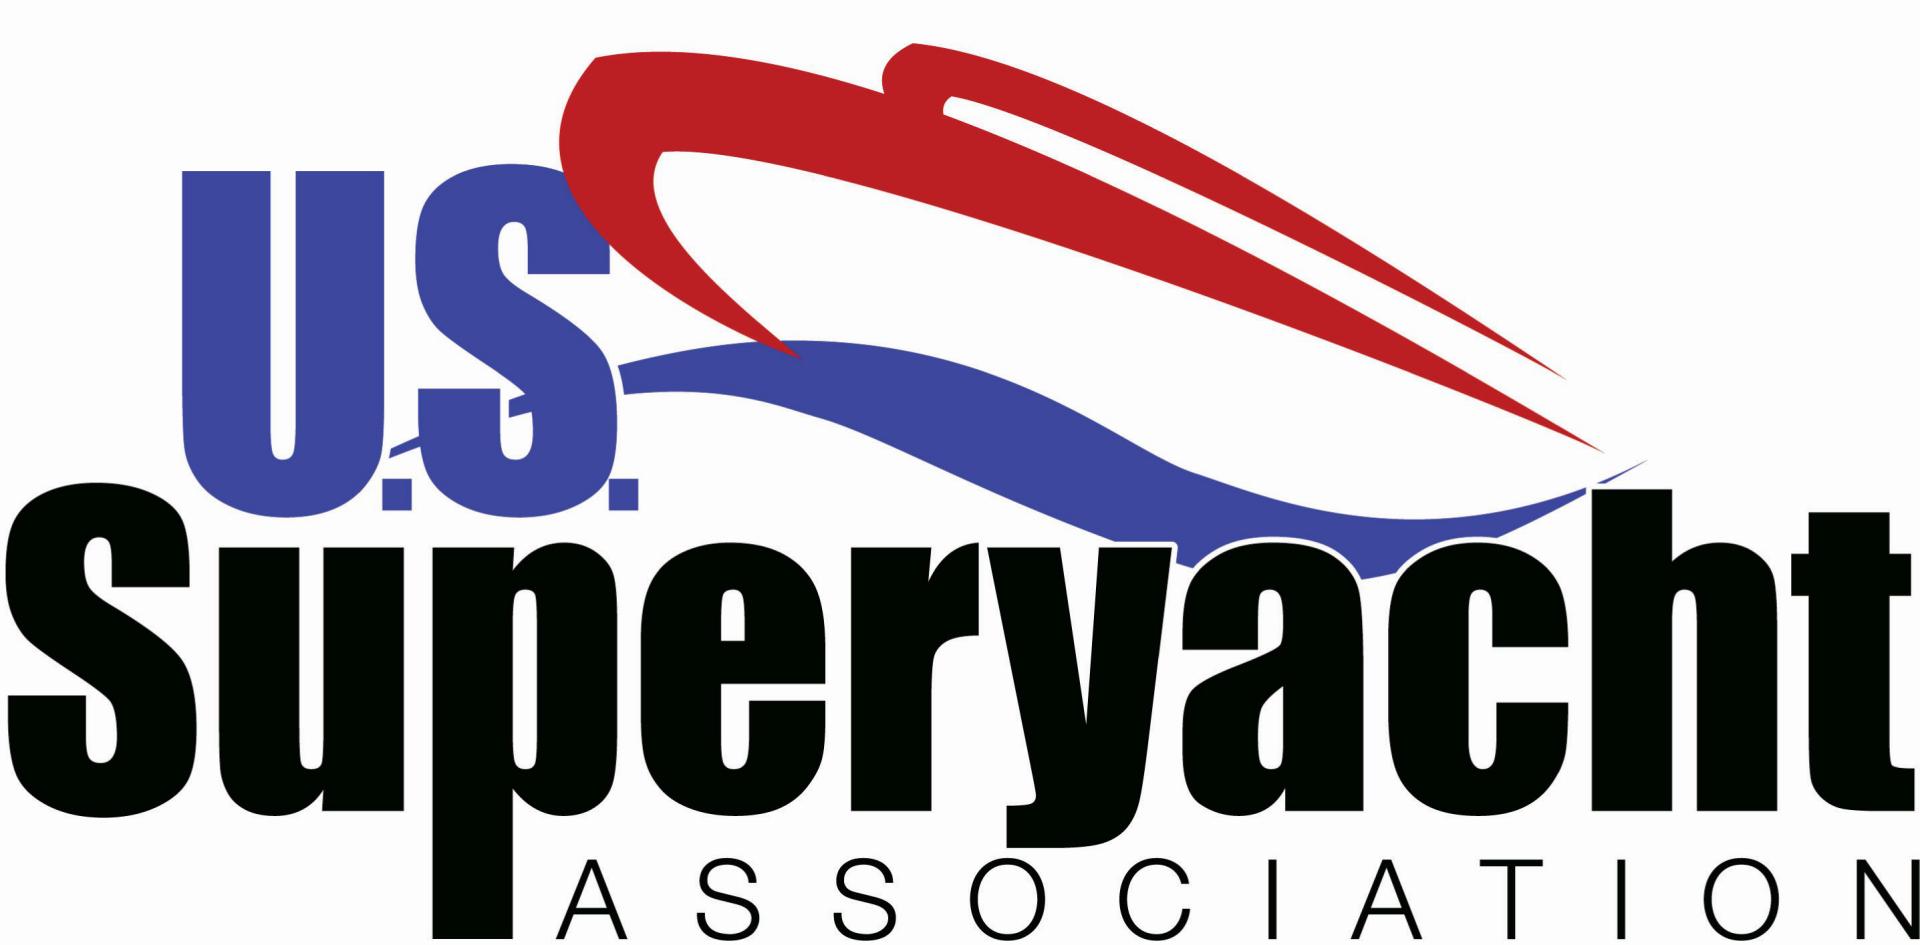 Member News - U.S. Superyacht Association